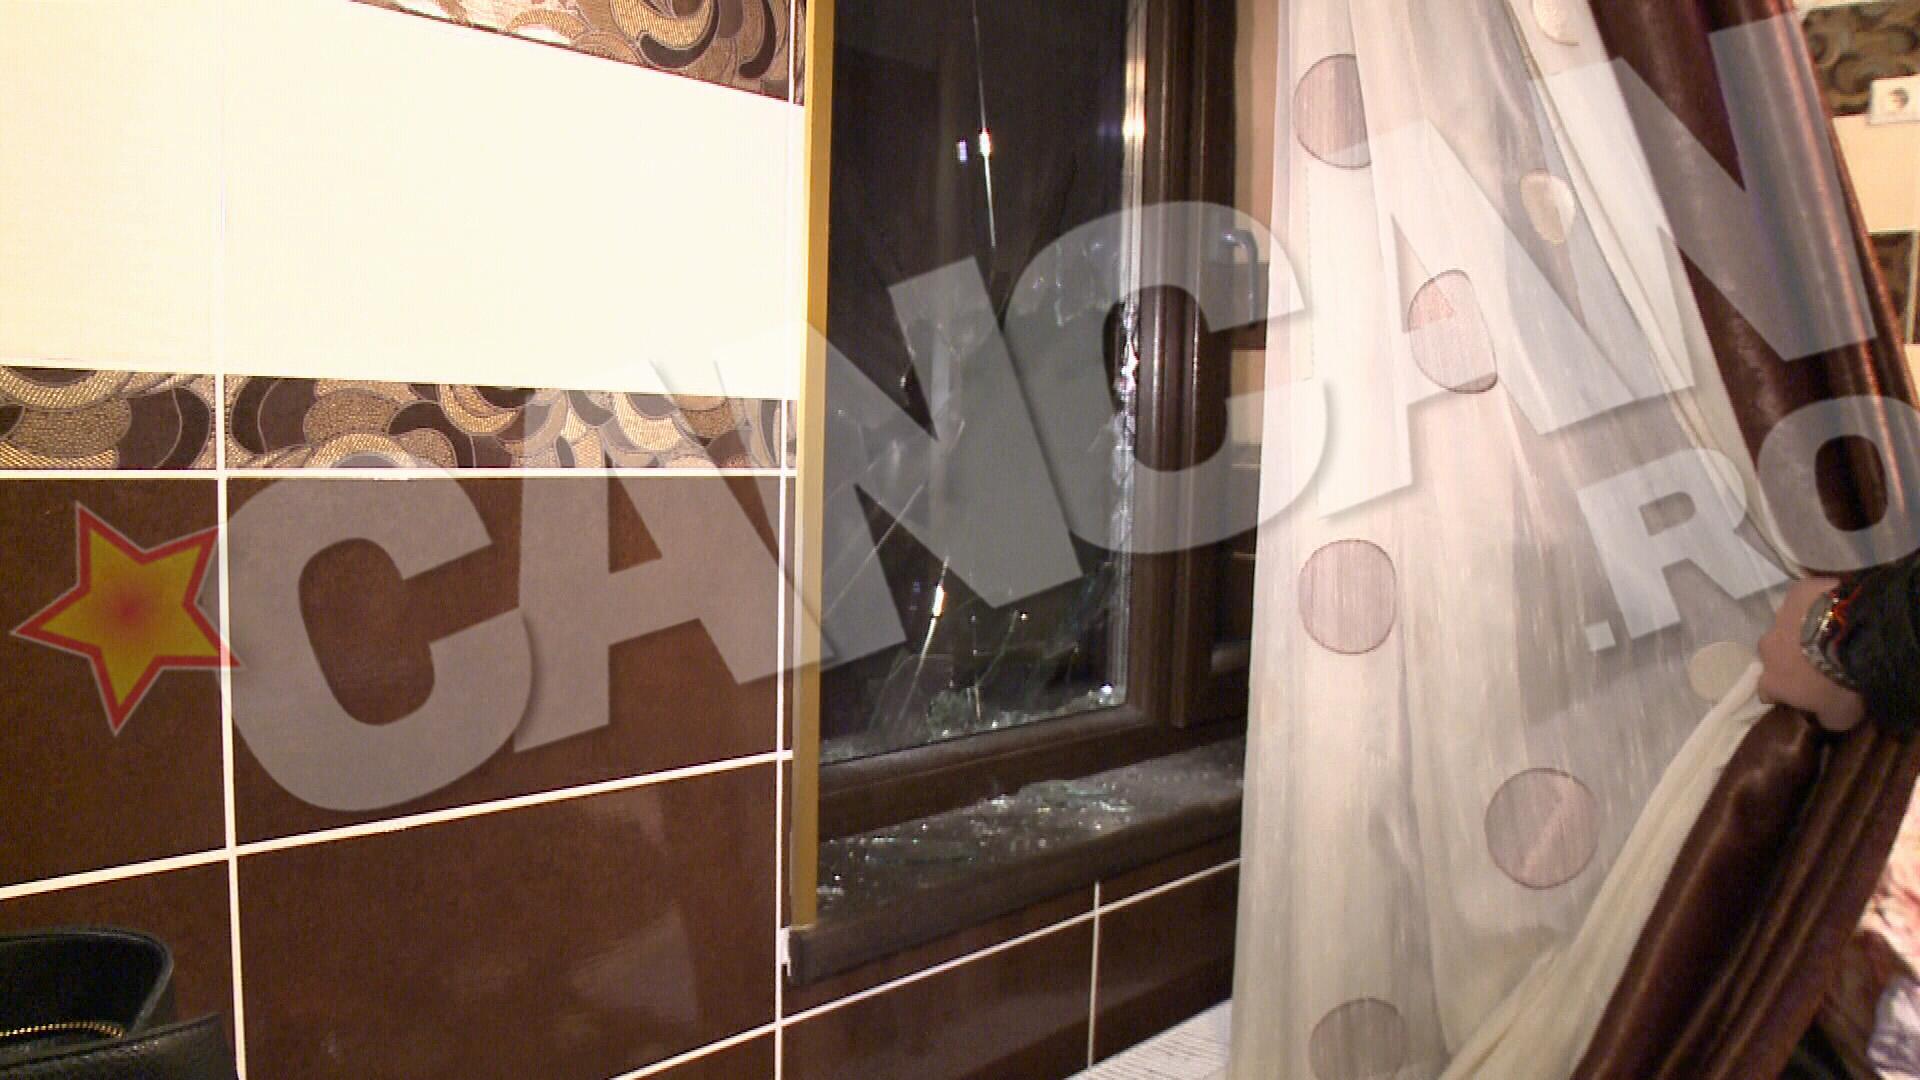 Narcisa si fiul ei au spart geamul de la parte pentru a intra in casa